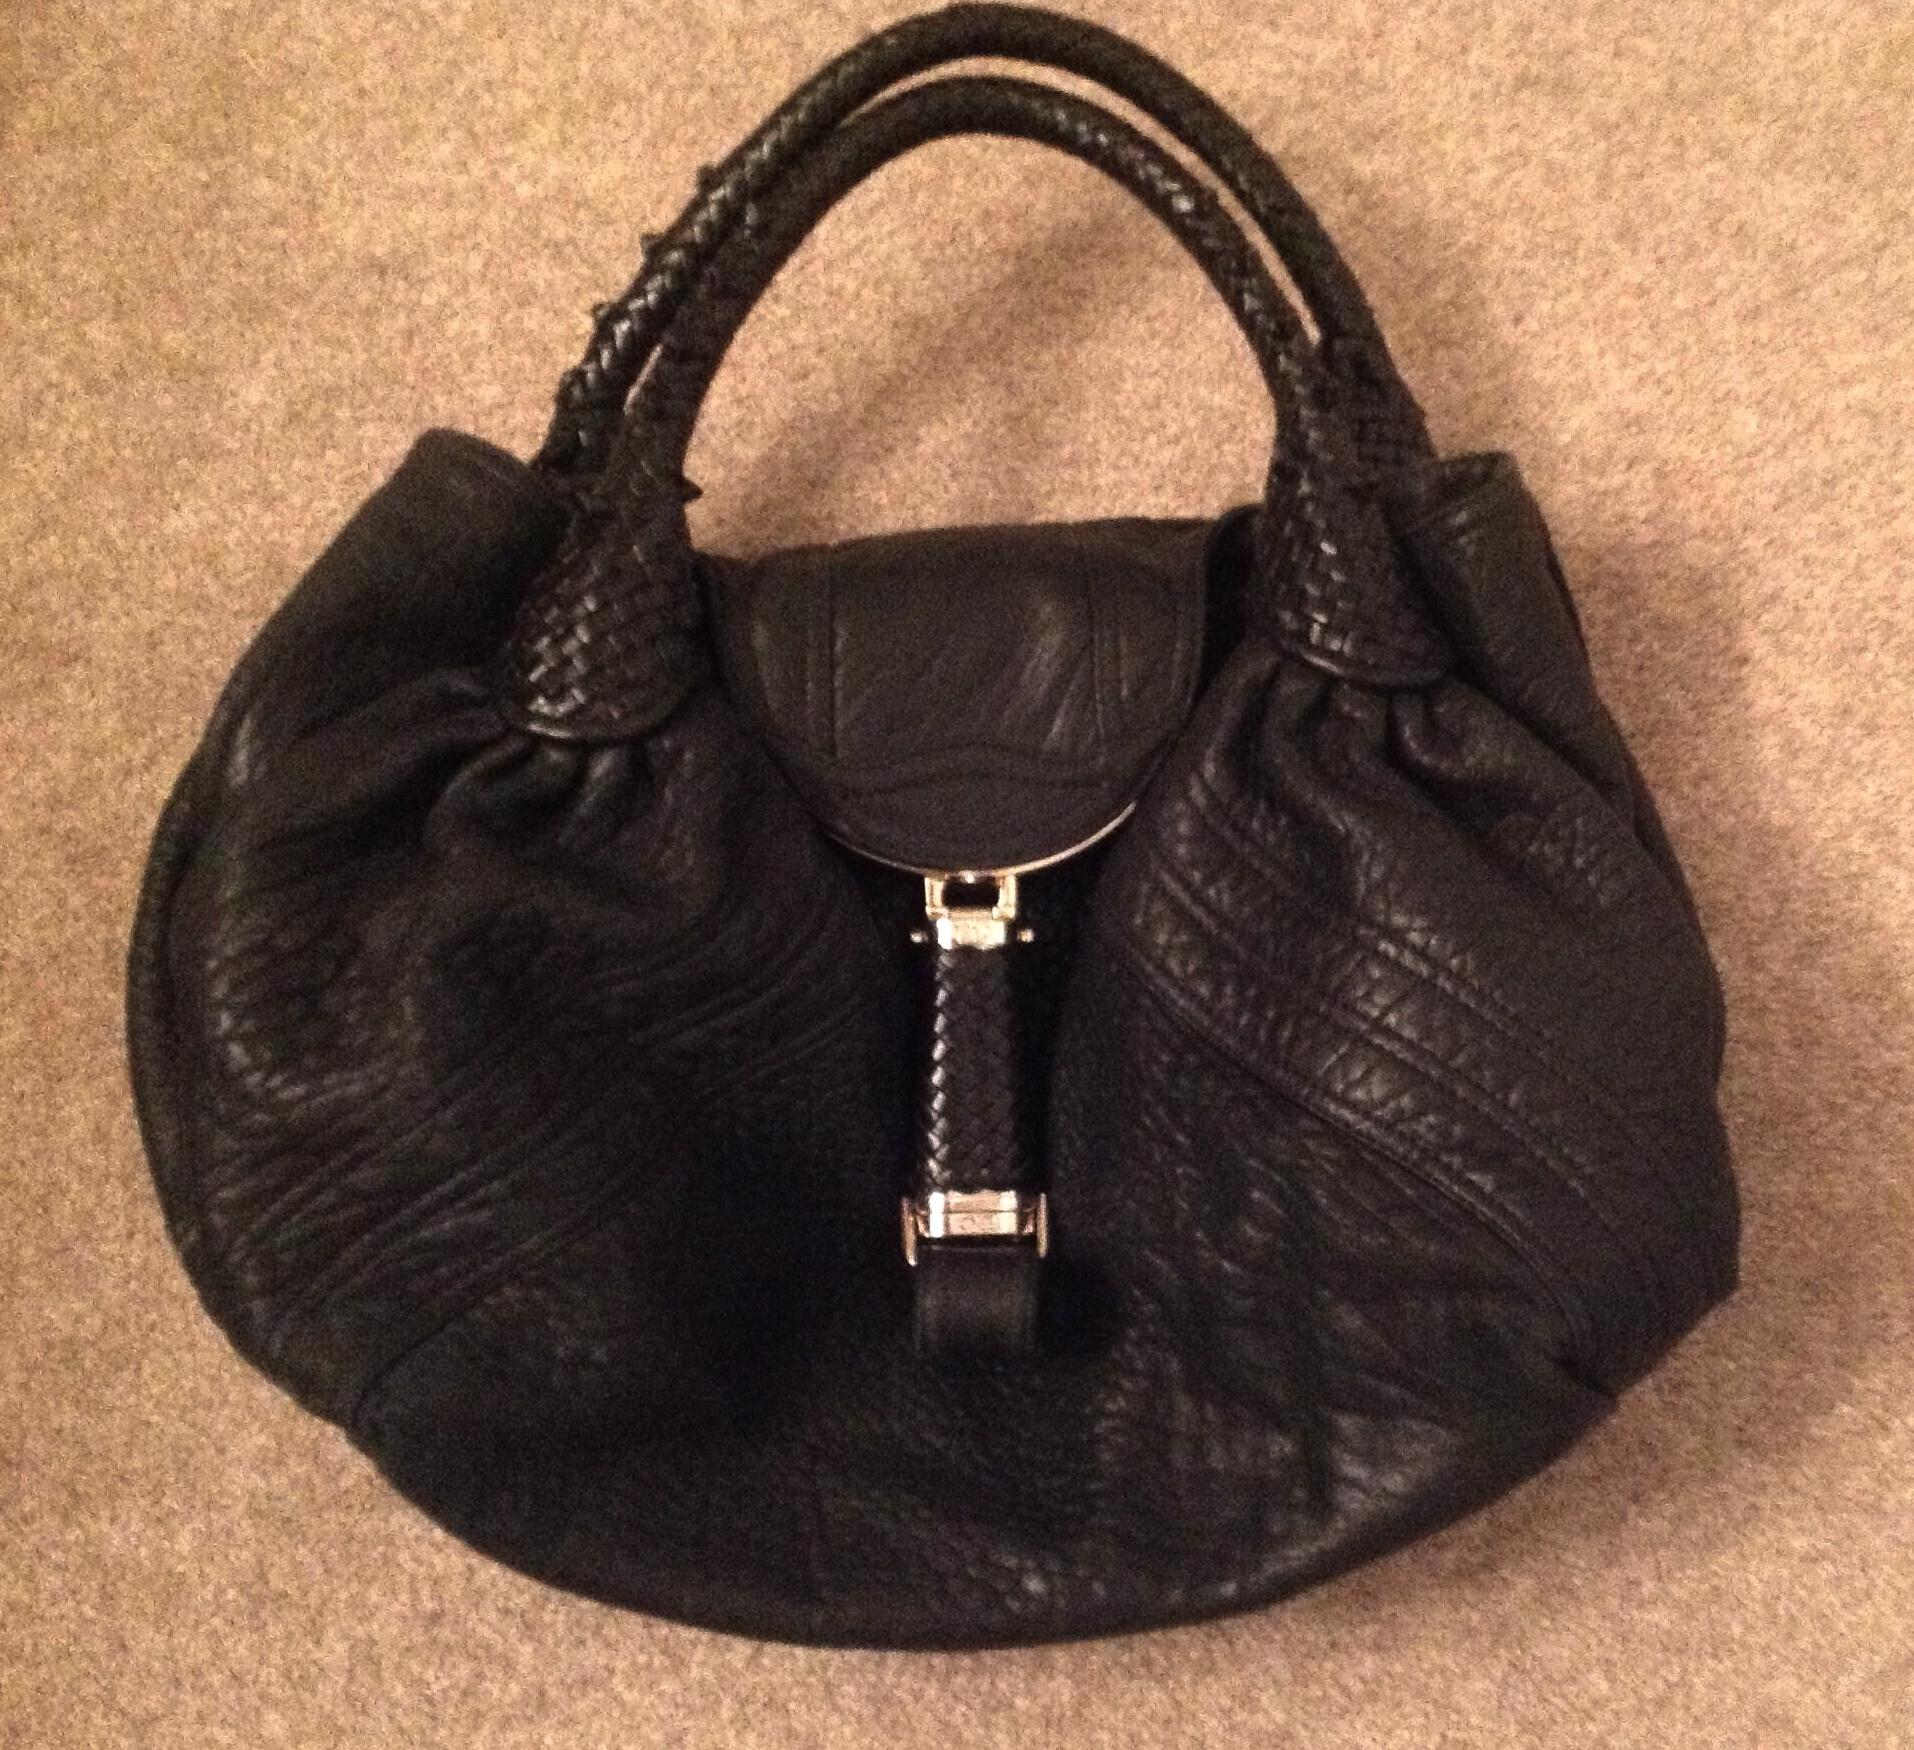 7645f94267ab where can i buy fendi spy bag measurements 4cdf1 c78e2